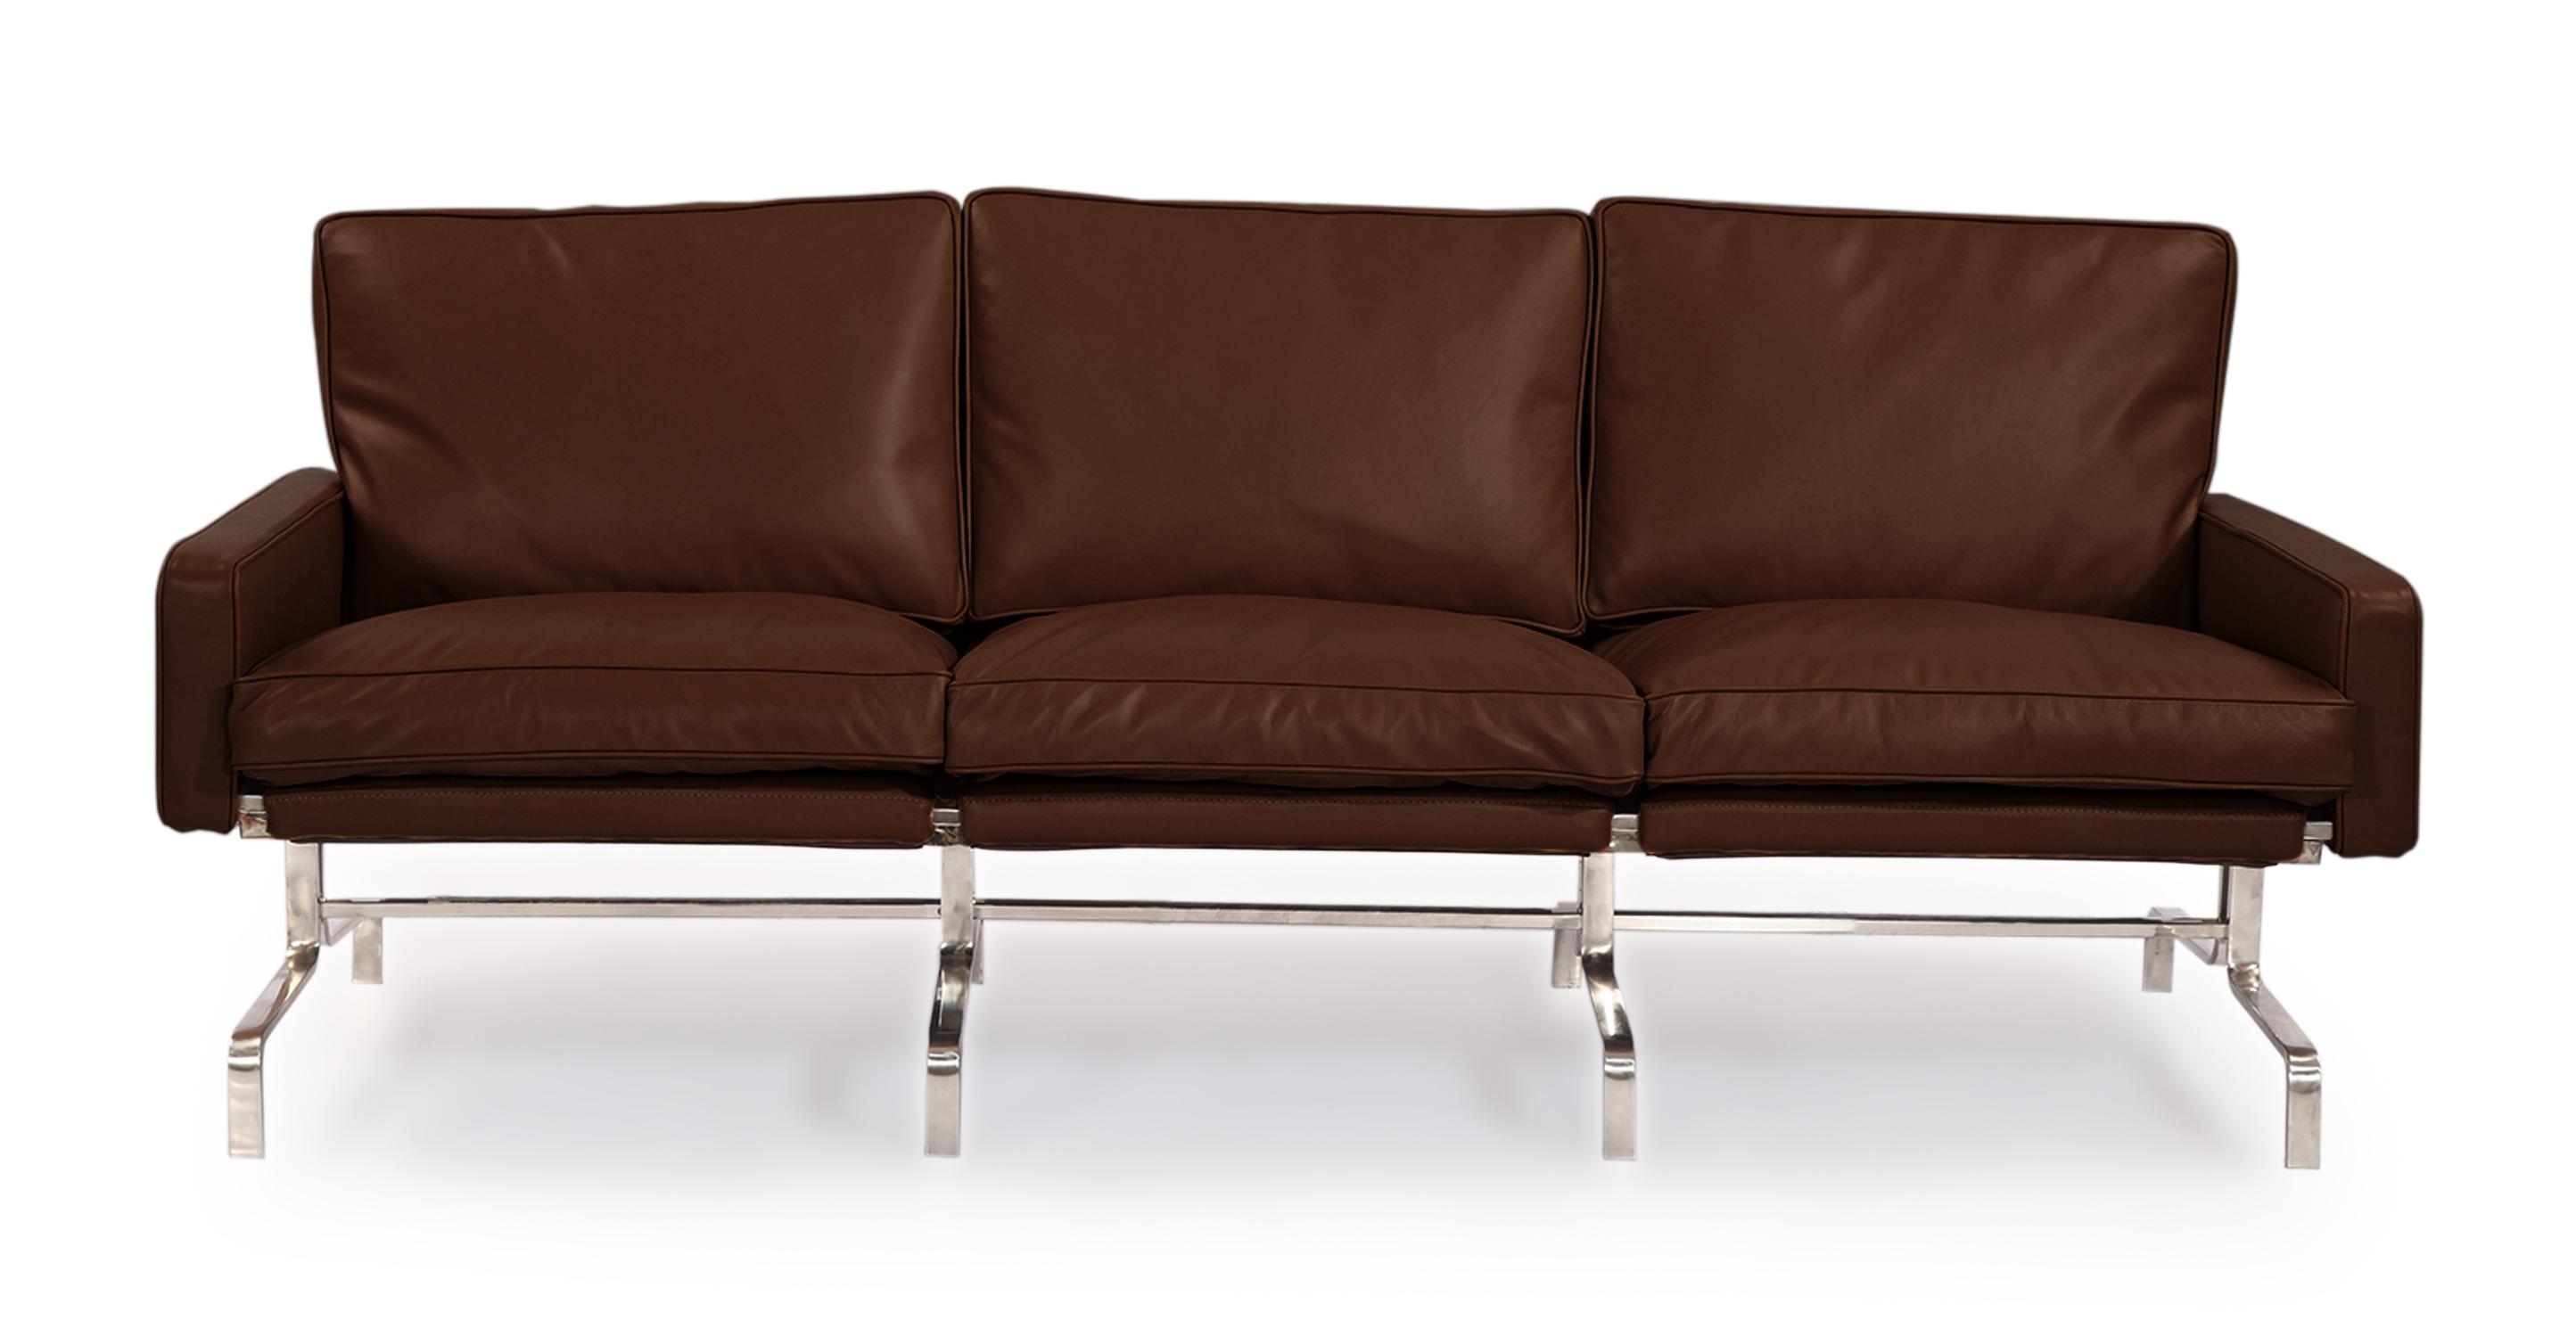 Kardiel PK31 Style Modern 3 Seat Sofa, Coco Brown Aniline...